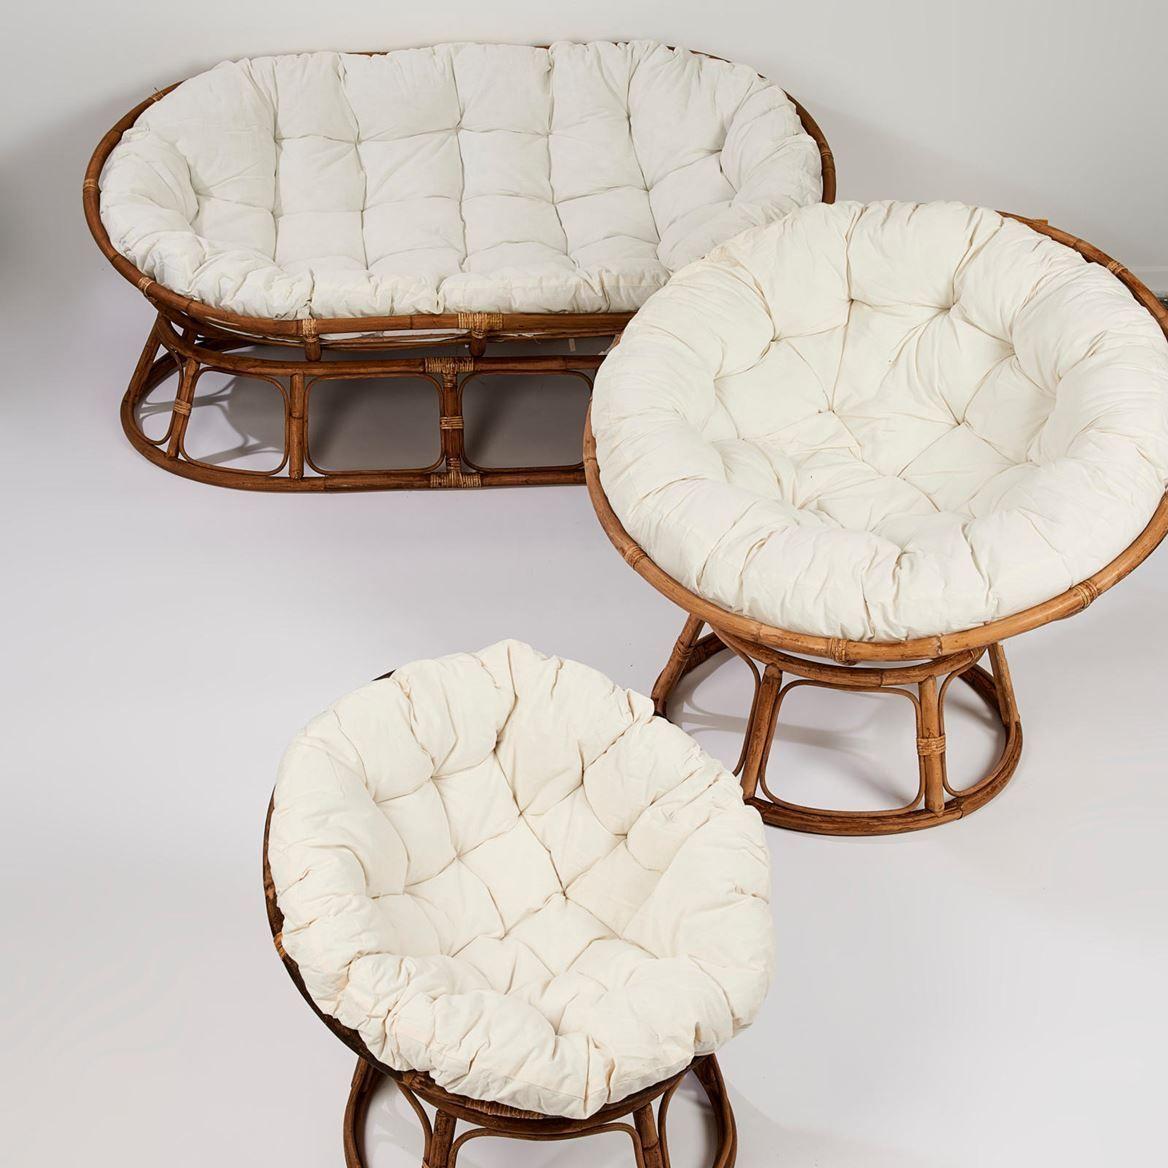 Papasan Chaise Lounge Naturel Blanc Casse H 85 Cm O 113 Cm In